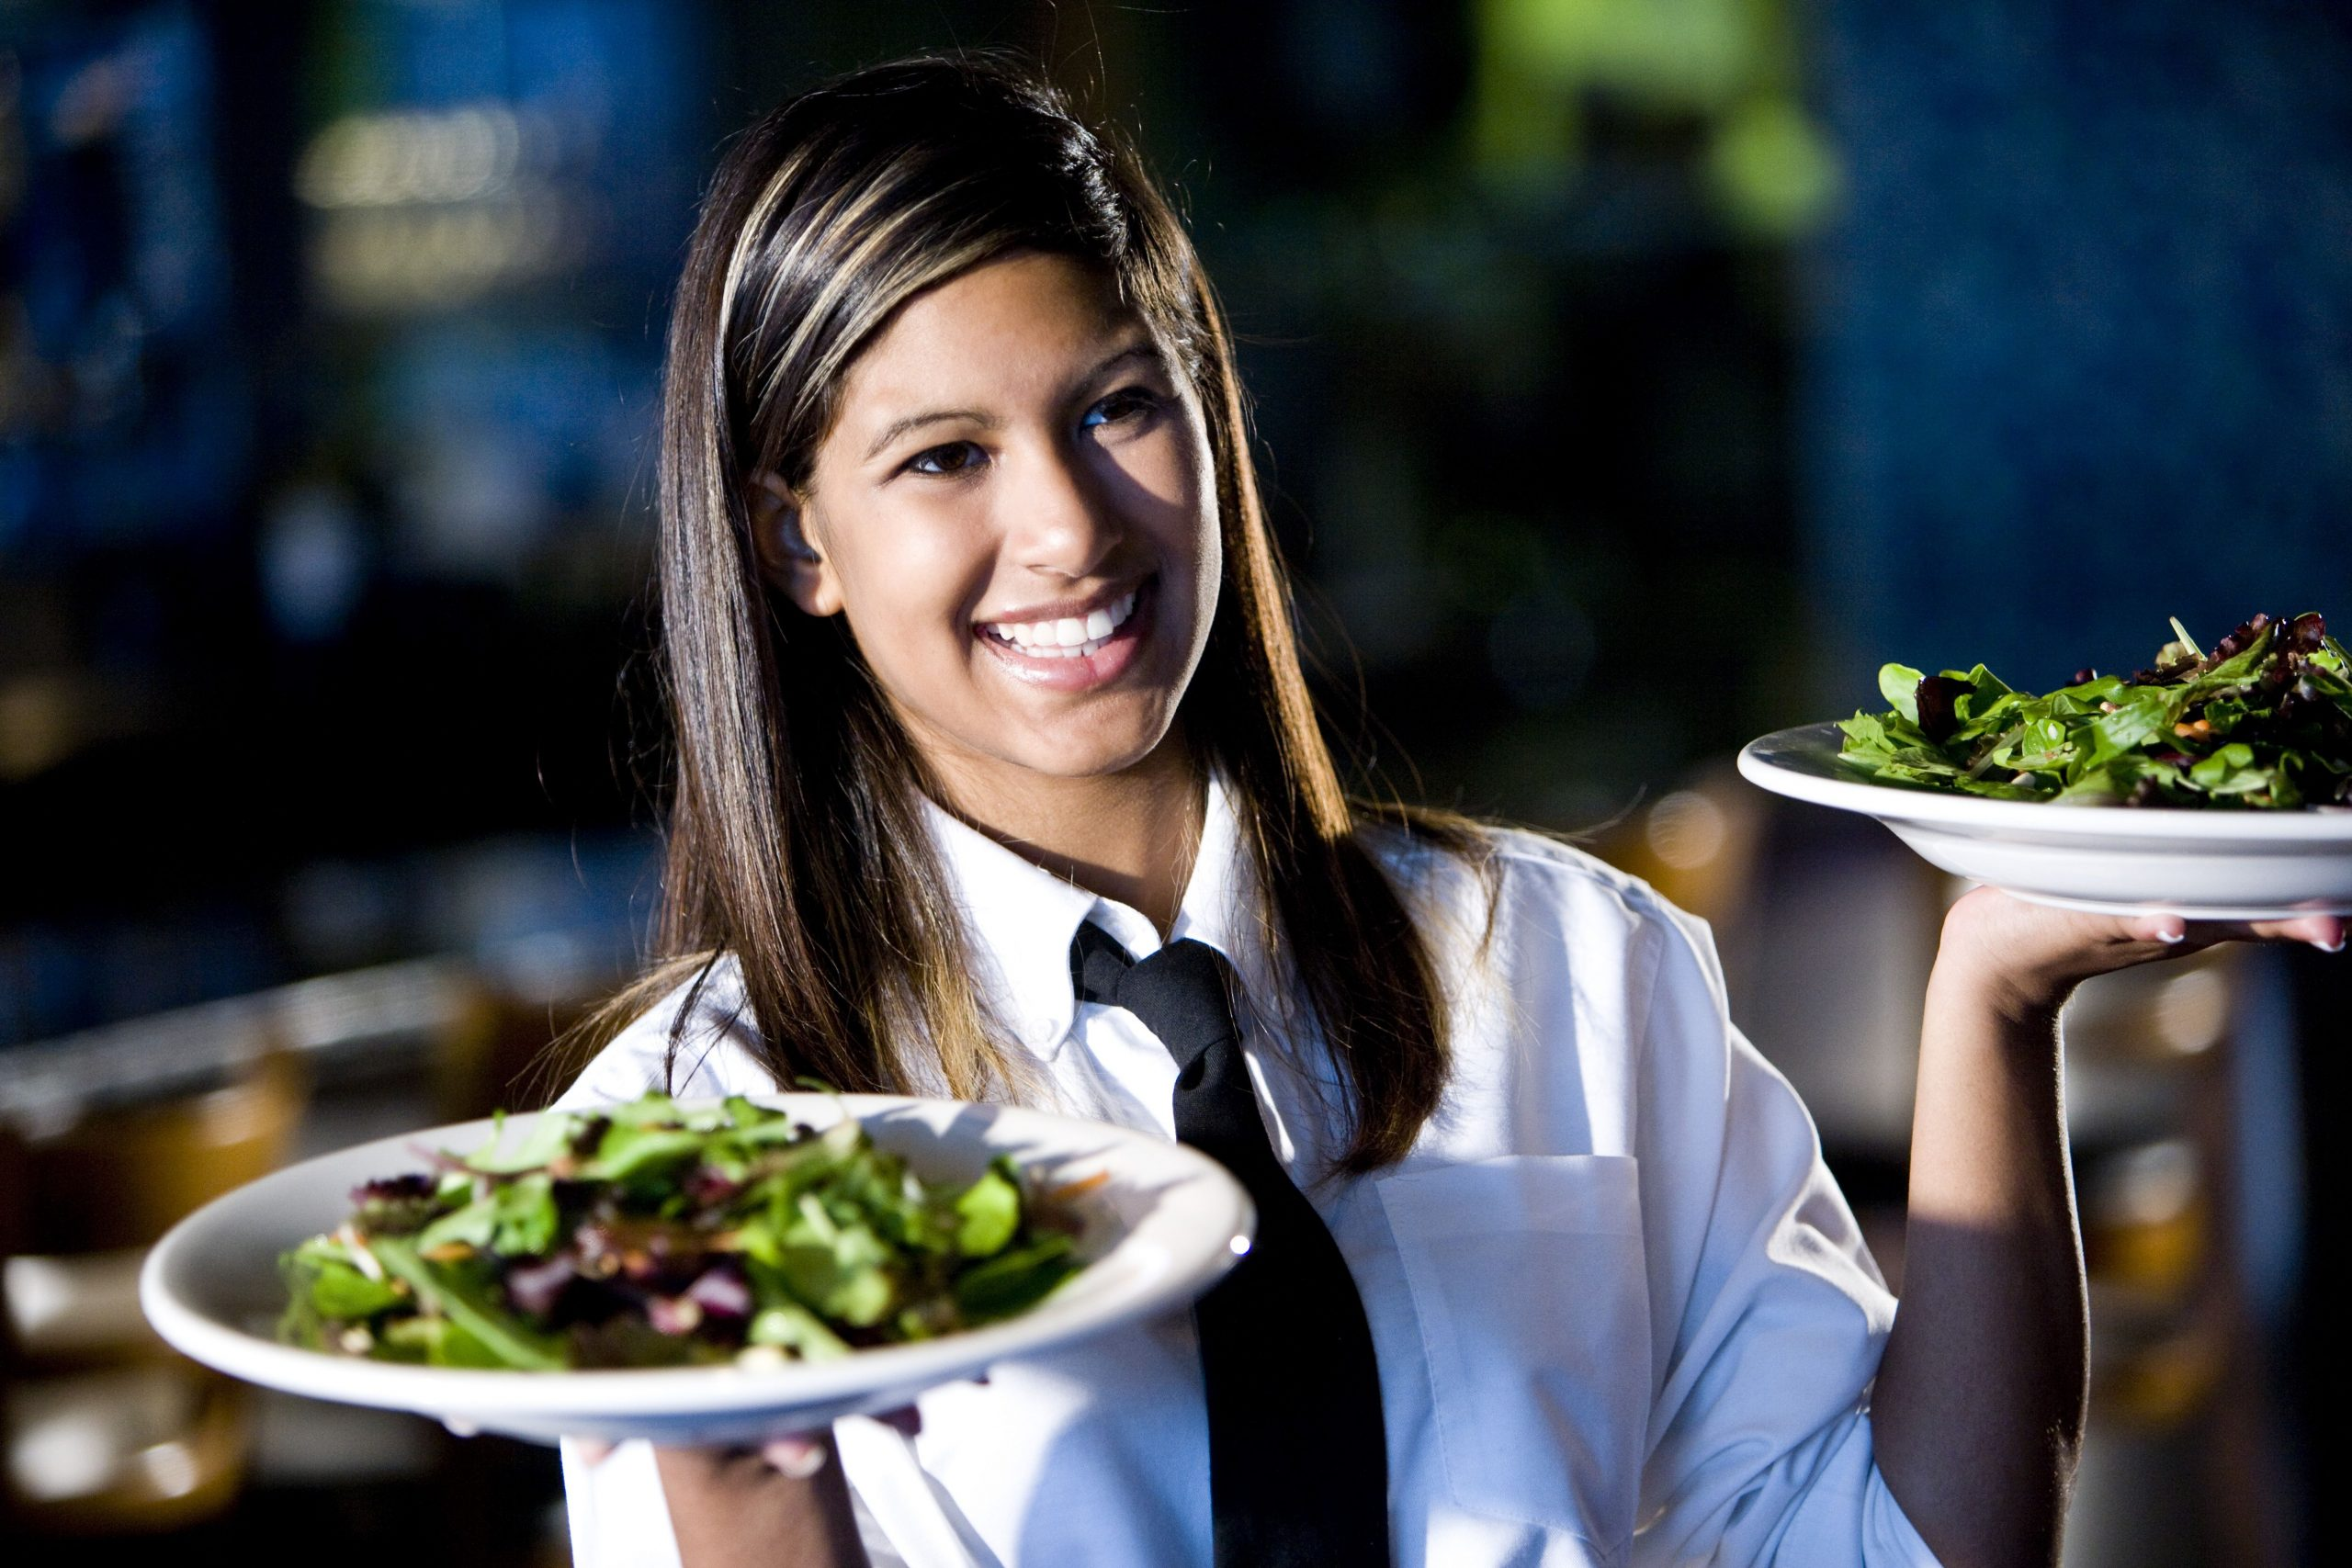 Serving food plater